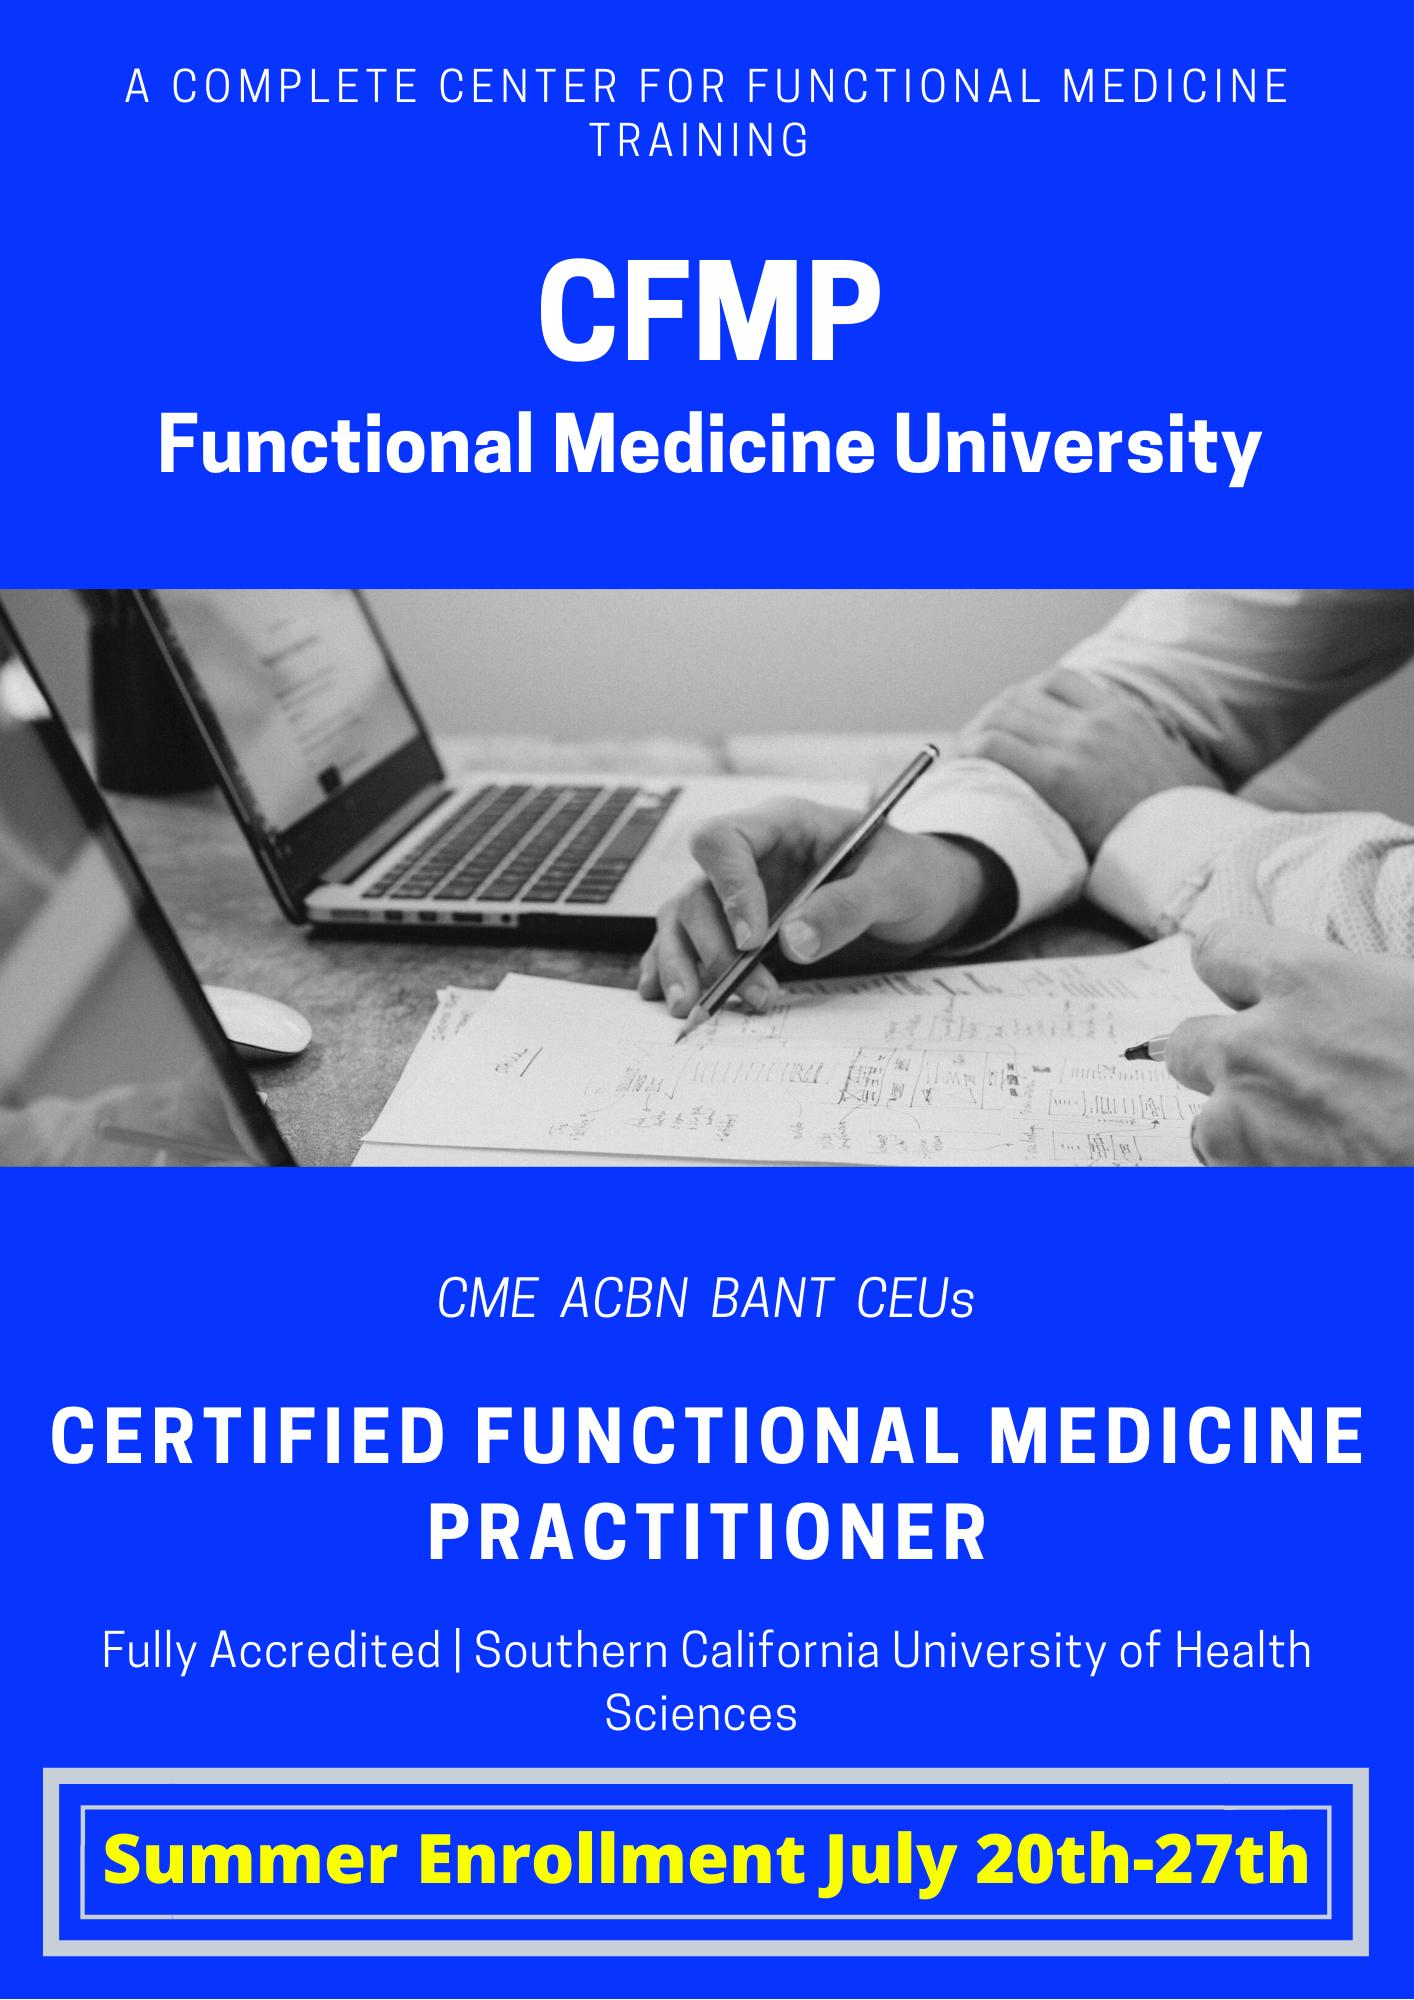 summer enrollment wee july 20-27th for the cfnp at functional medicine university